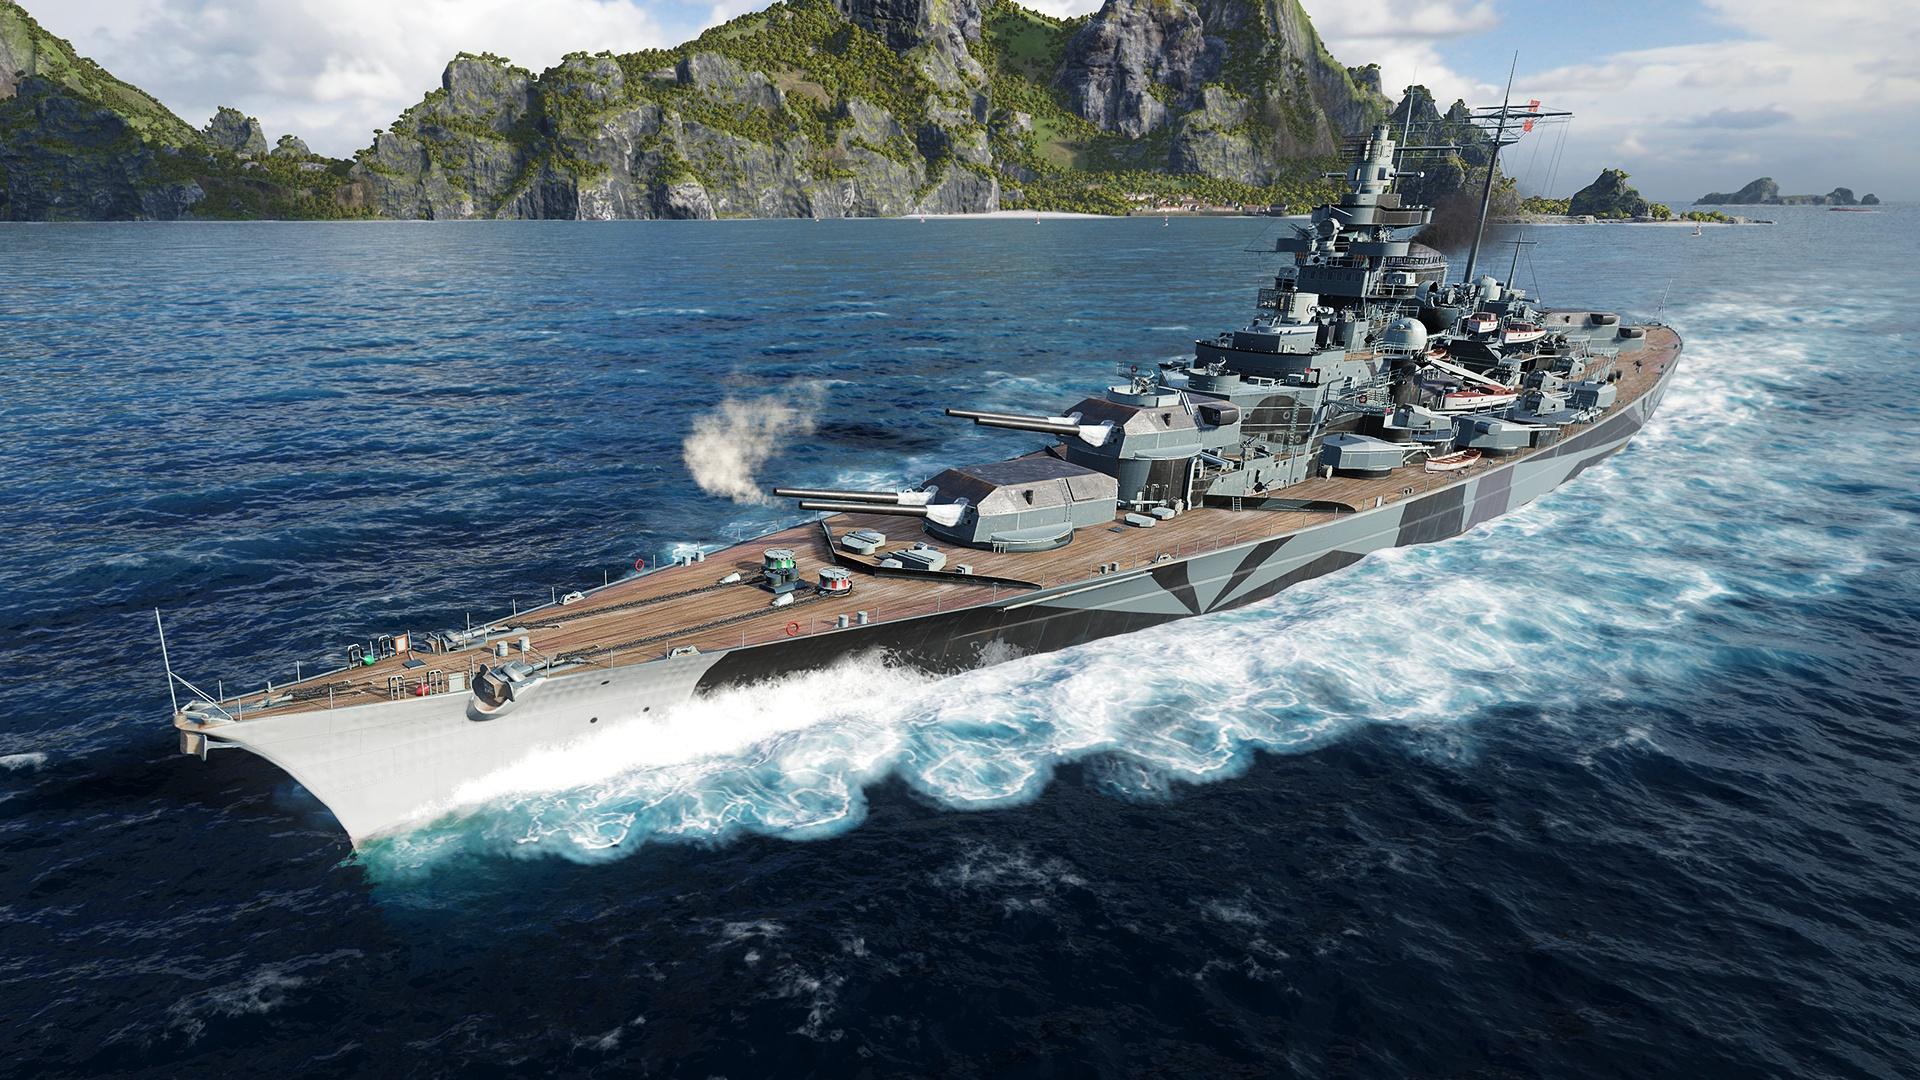 WoWSL_noLogo_noUI_EN_AugustRelease_Tirpitz08_1920x1080.jpg